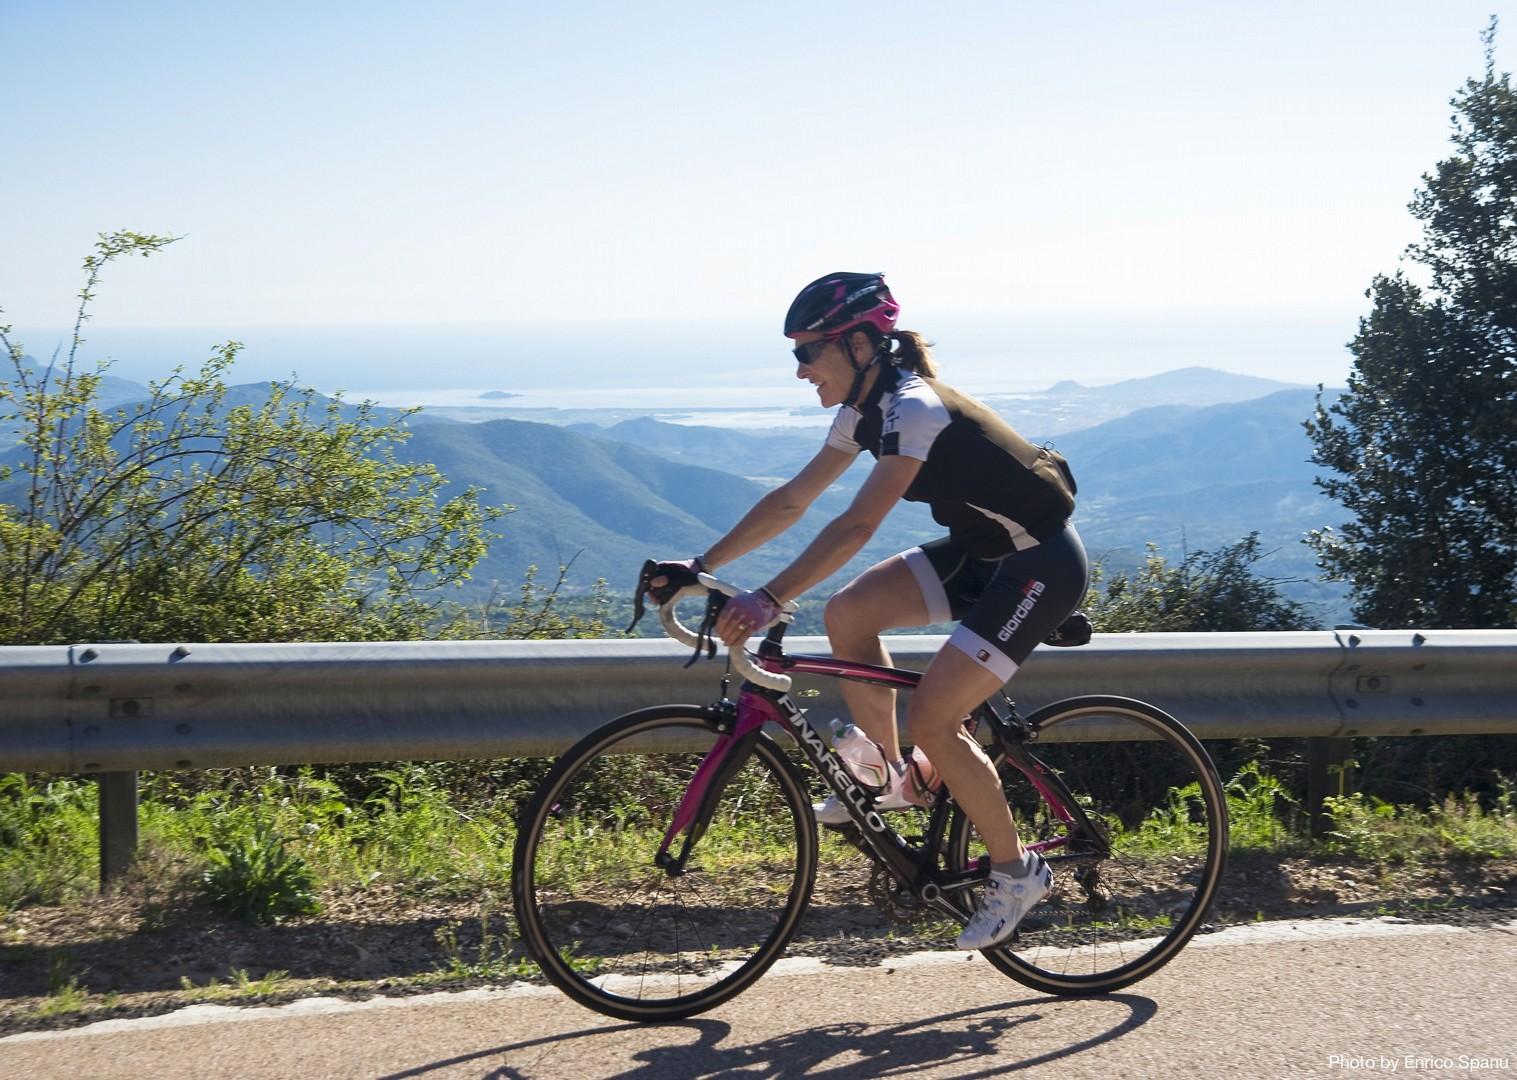 Guided-Road-Cycling-Holiday-Sardinia-Sardinian-Mountains-Monte-Corrasi.jpg - Italy - Sardinia - Sardinian Mountains - Guided Road Cycling Holiday - Italia Road Cycling